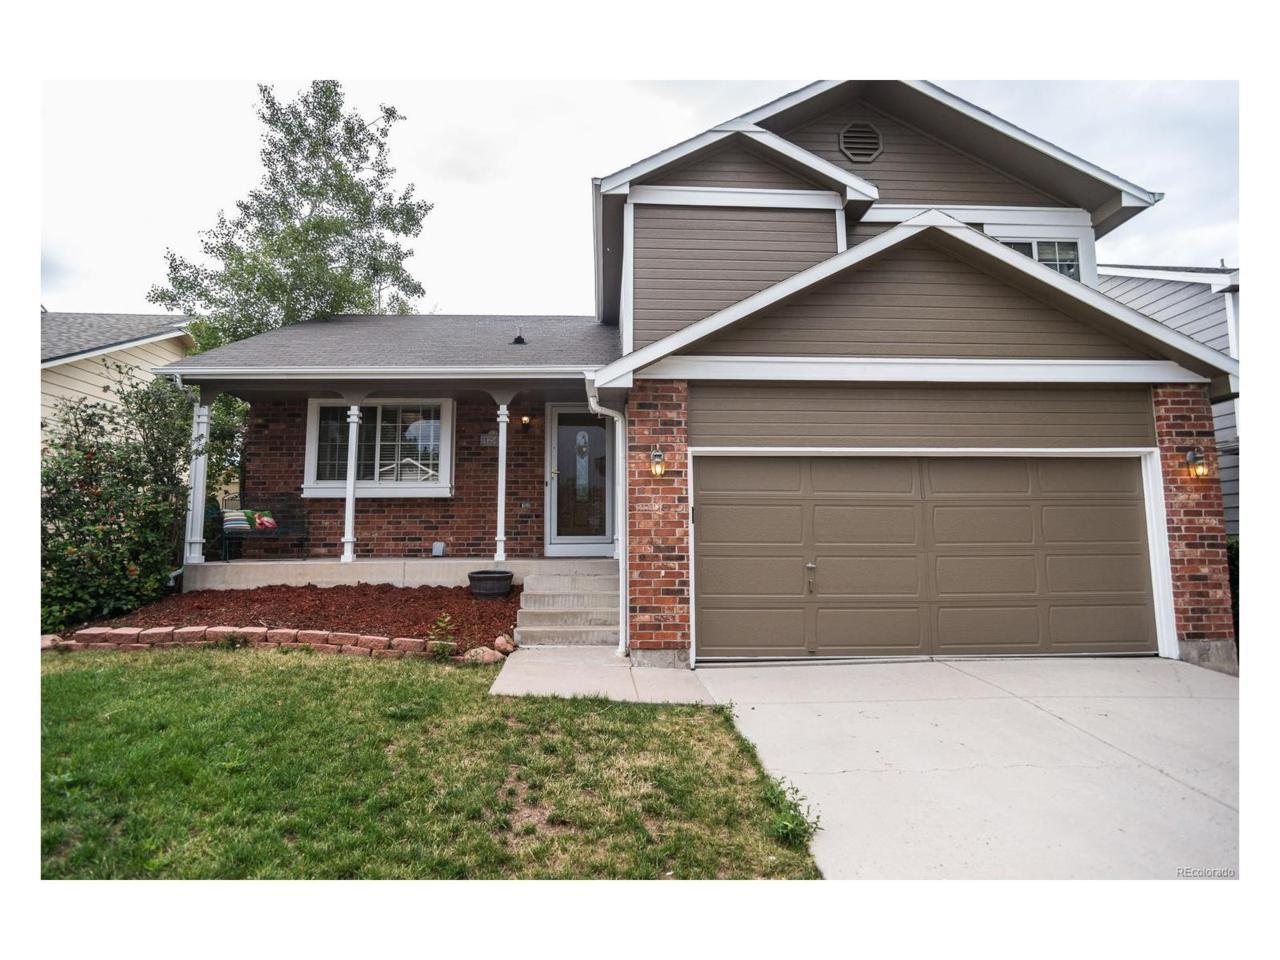 12541 W Prentice Place, Littleton, CO 80127 (MLS #5379612) :: 8z Real Estate